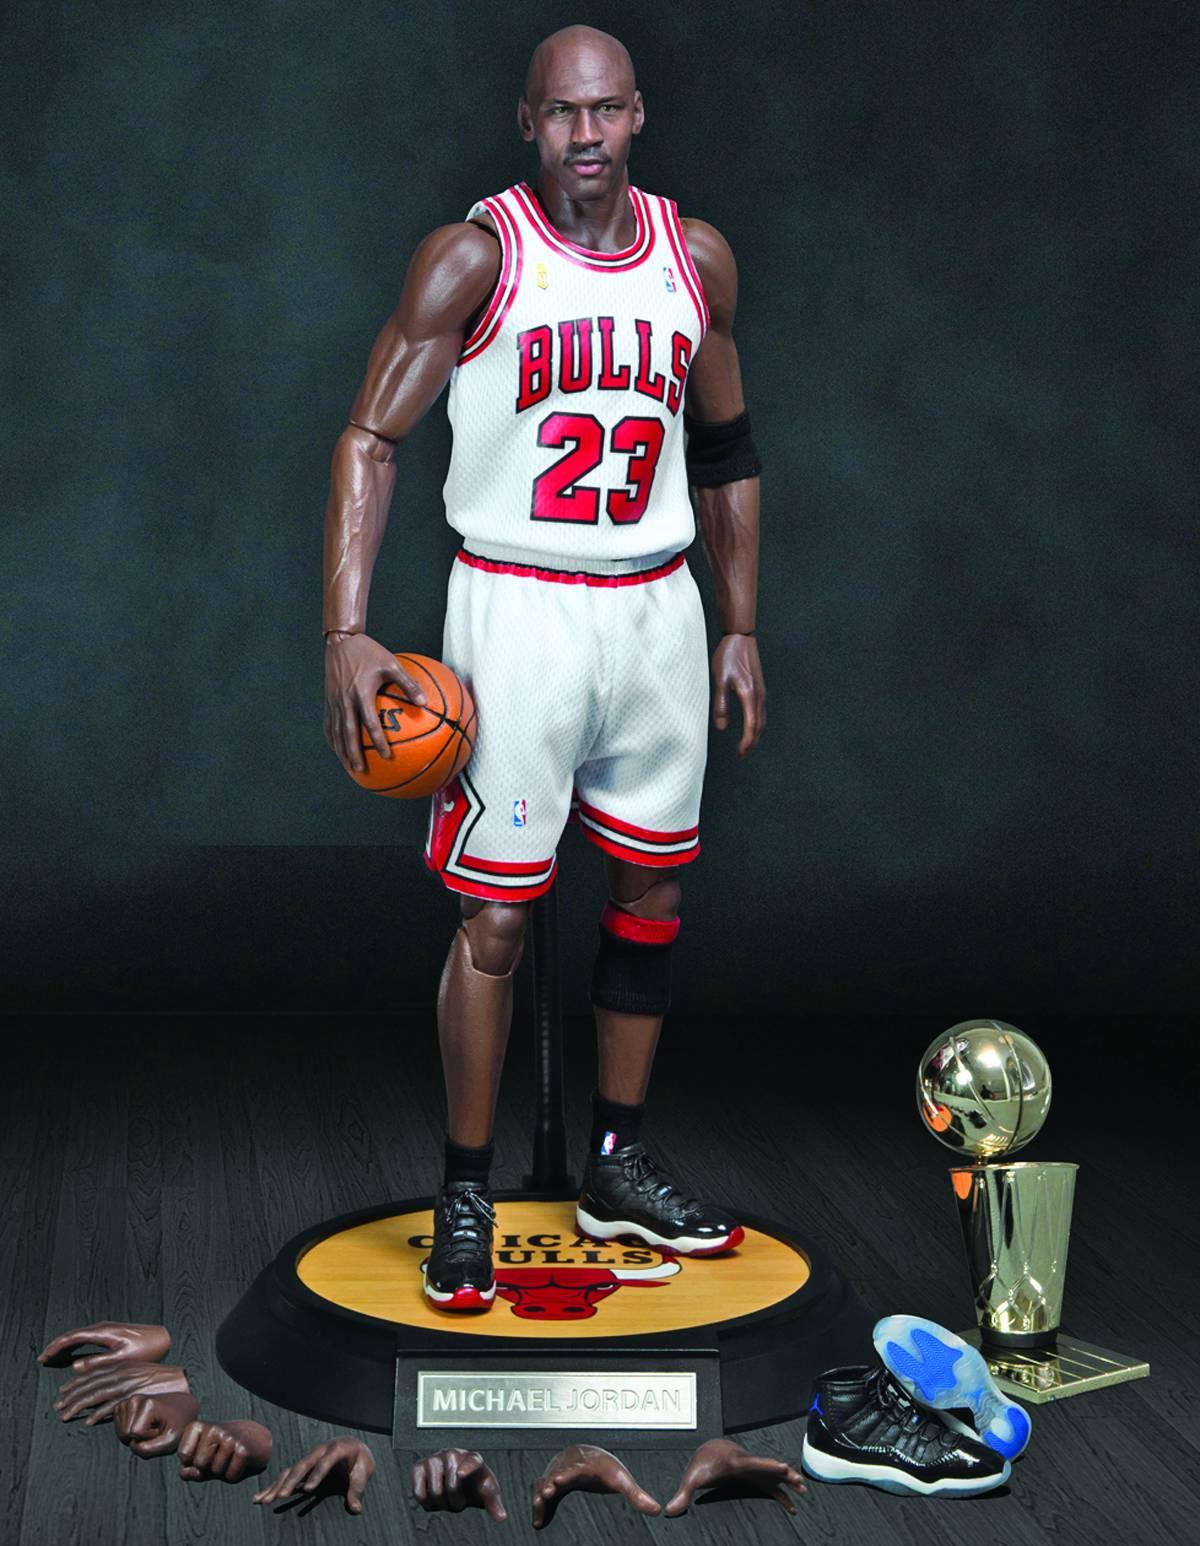 Michael Jordan Bulls 23 Red Jersey Real Masterpiece Figure Enterbay Real  Masterpiece NBA Collec 9de3f1c8a